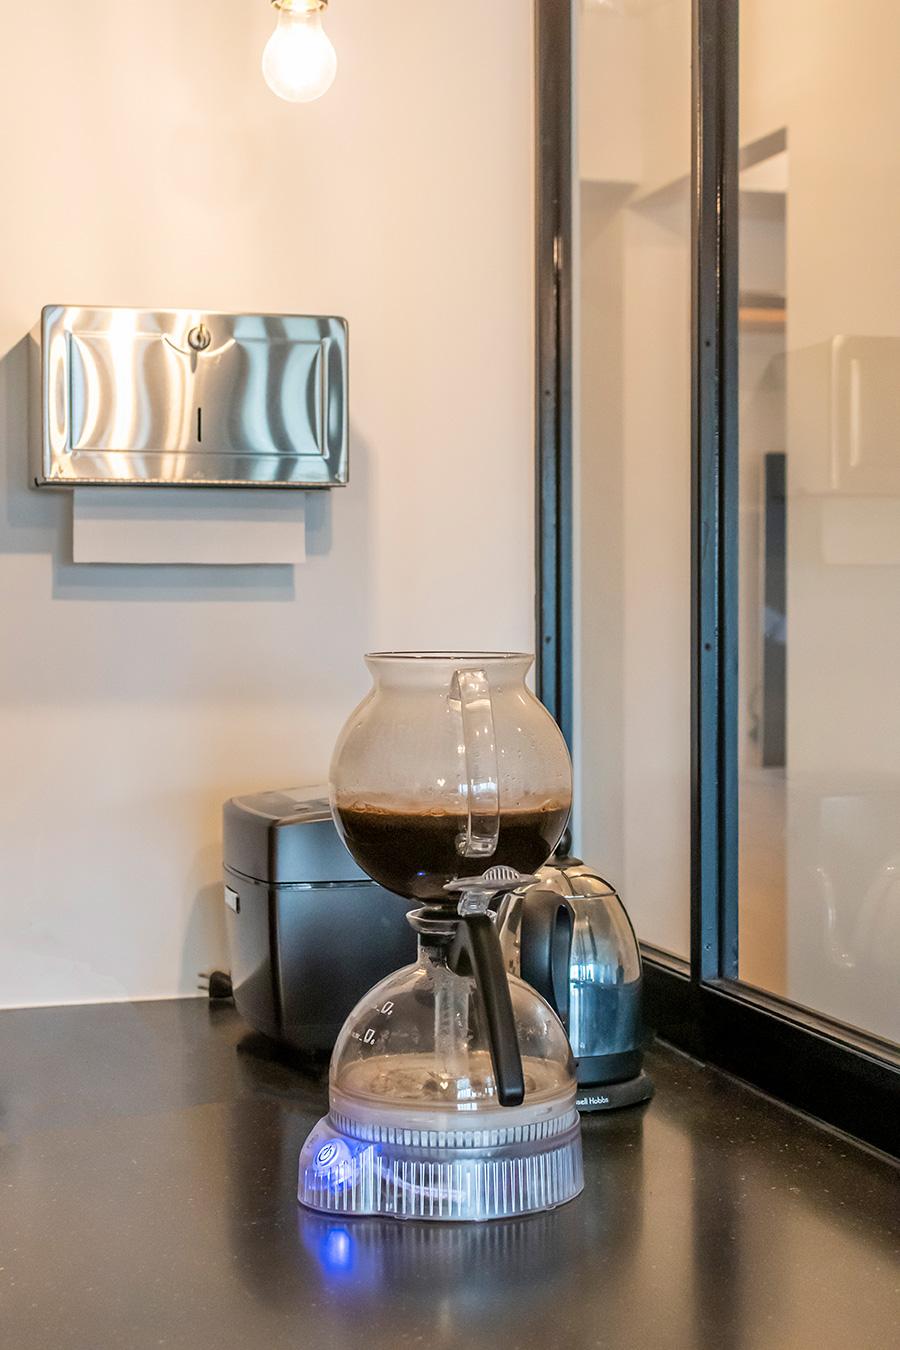 「bodum」の電気式サイフォンコーヒーメーカー。